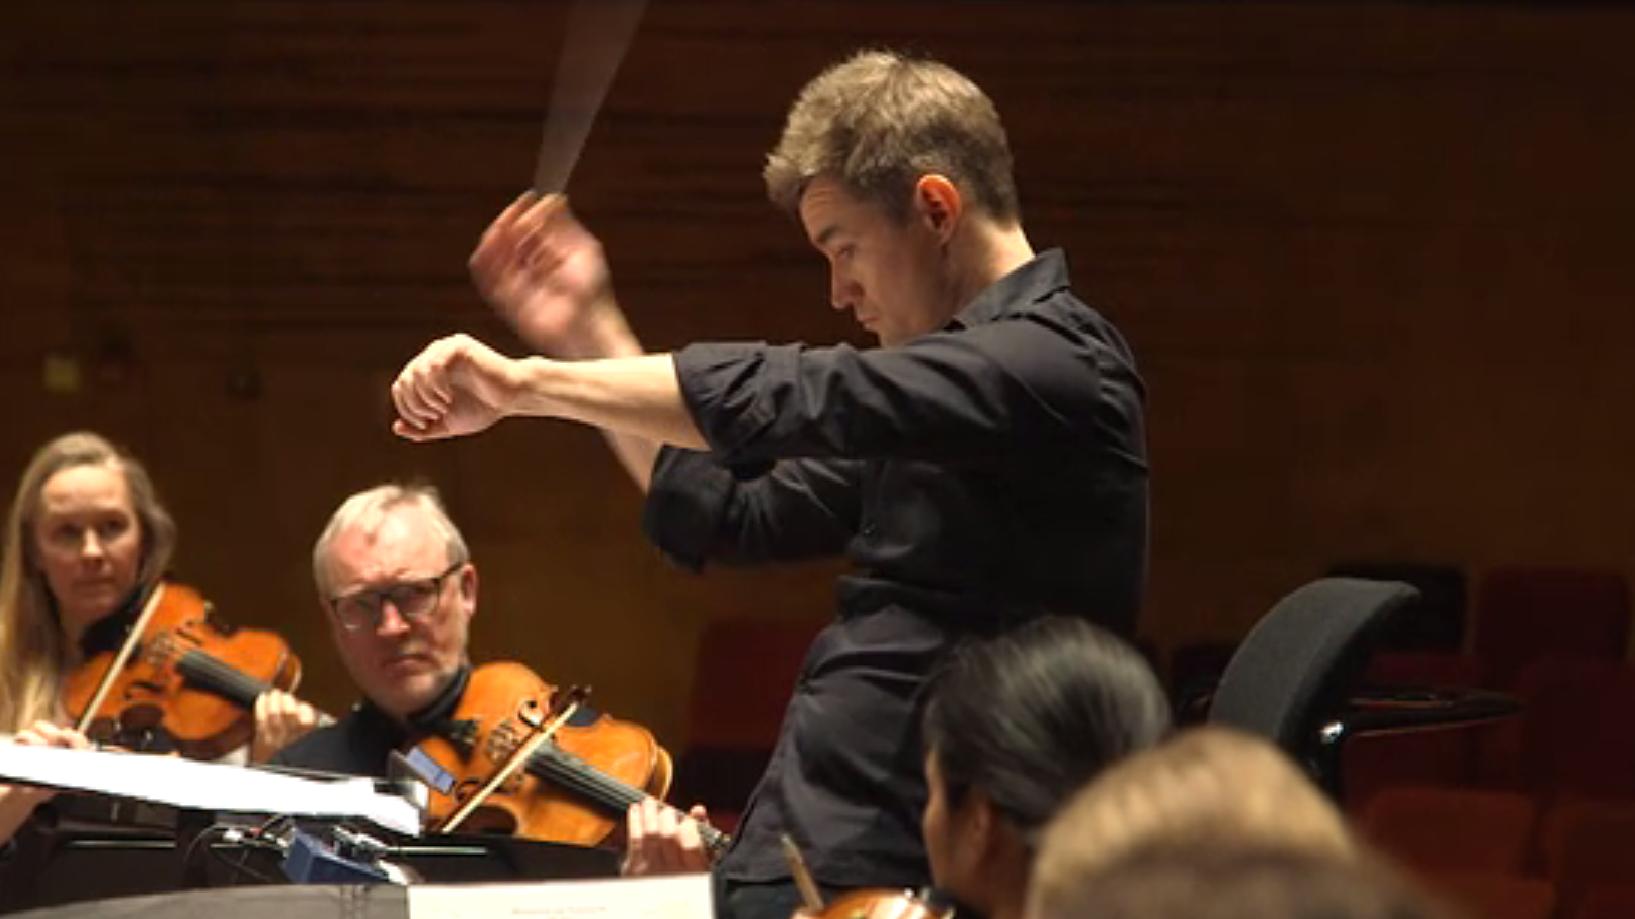 dirigent_intro_musik_2_0.png